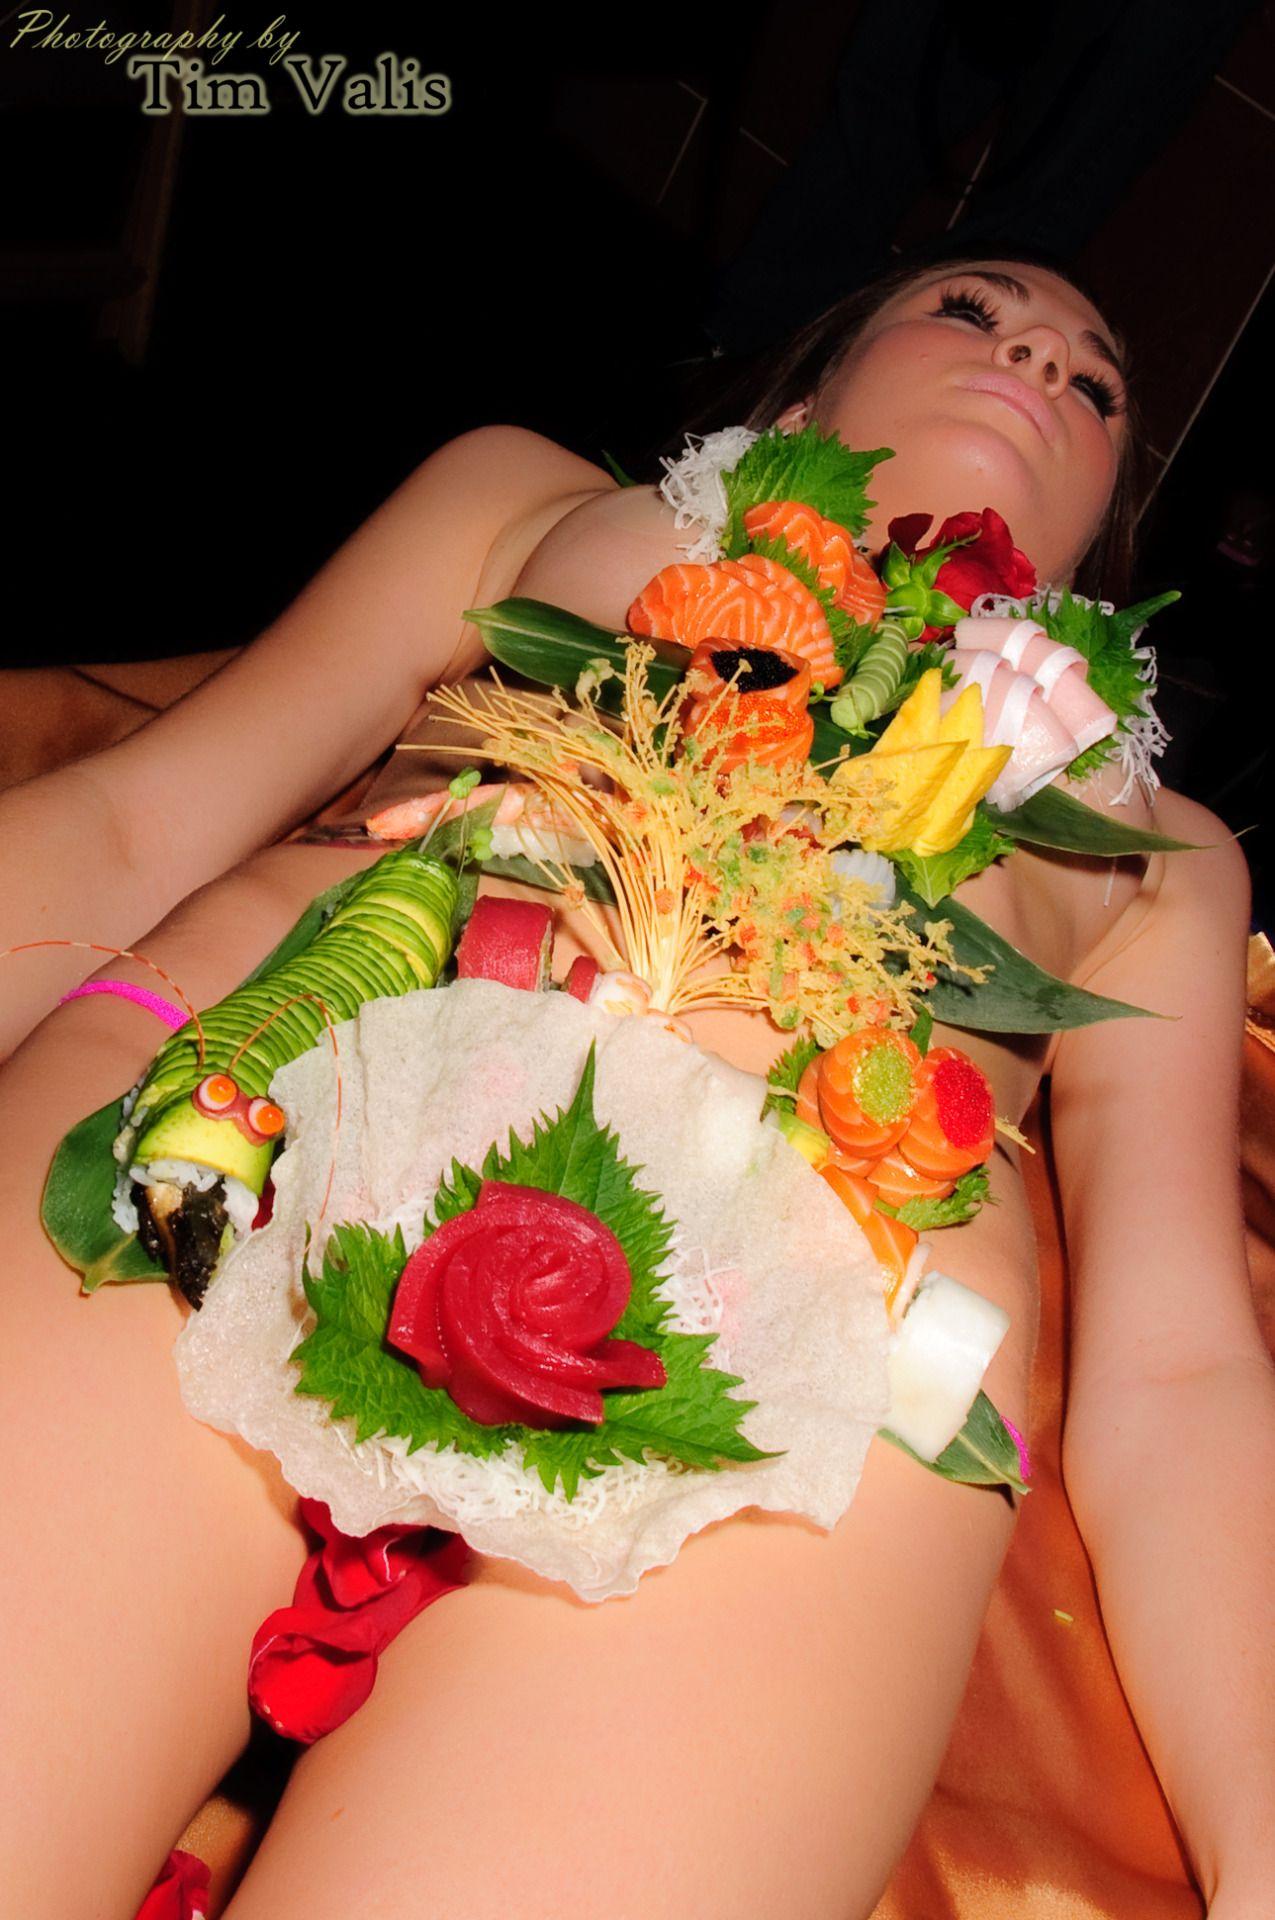 Nyotaimori  Naked Sushi  Body Sushi  Nyotaimori  Pinterest-6837